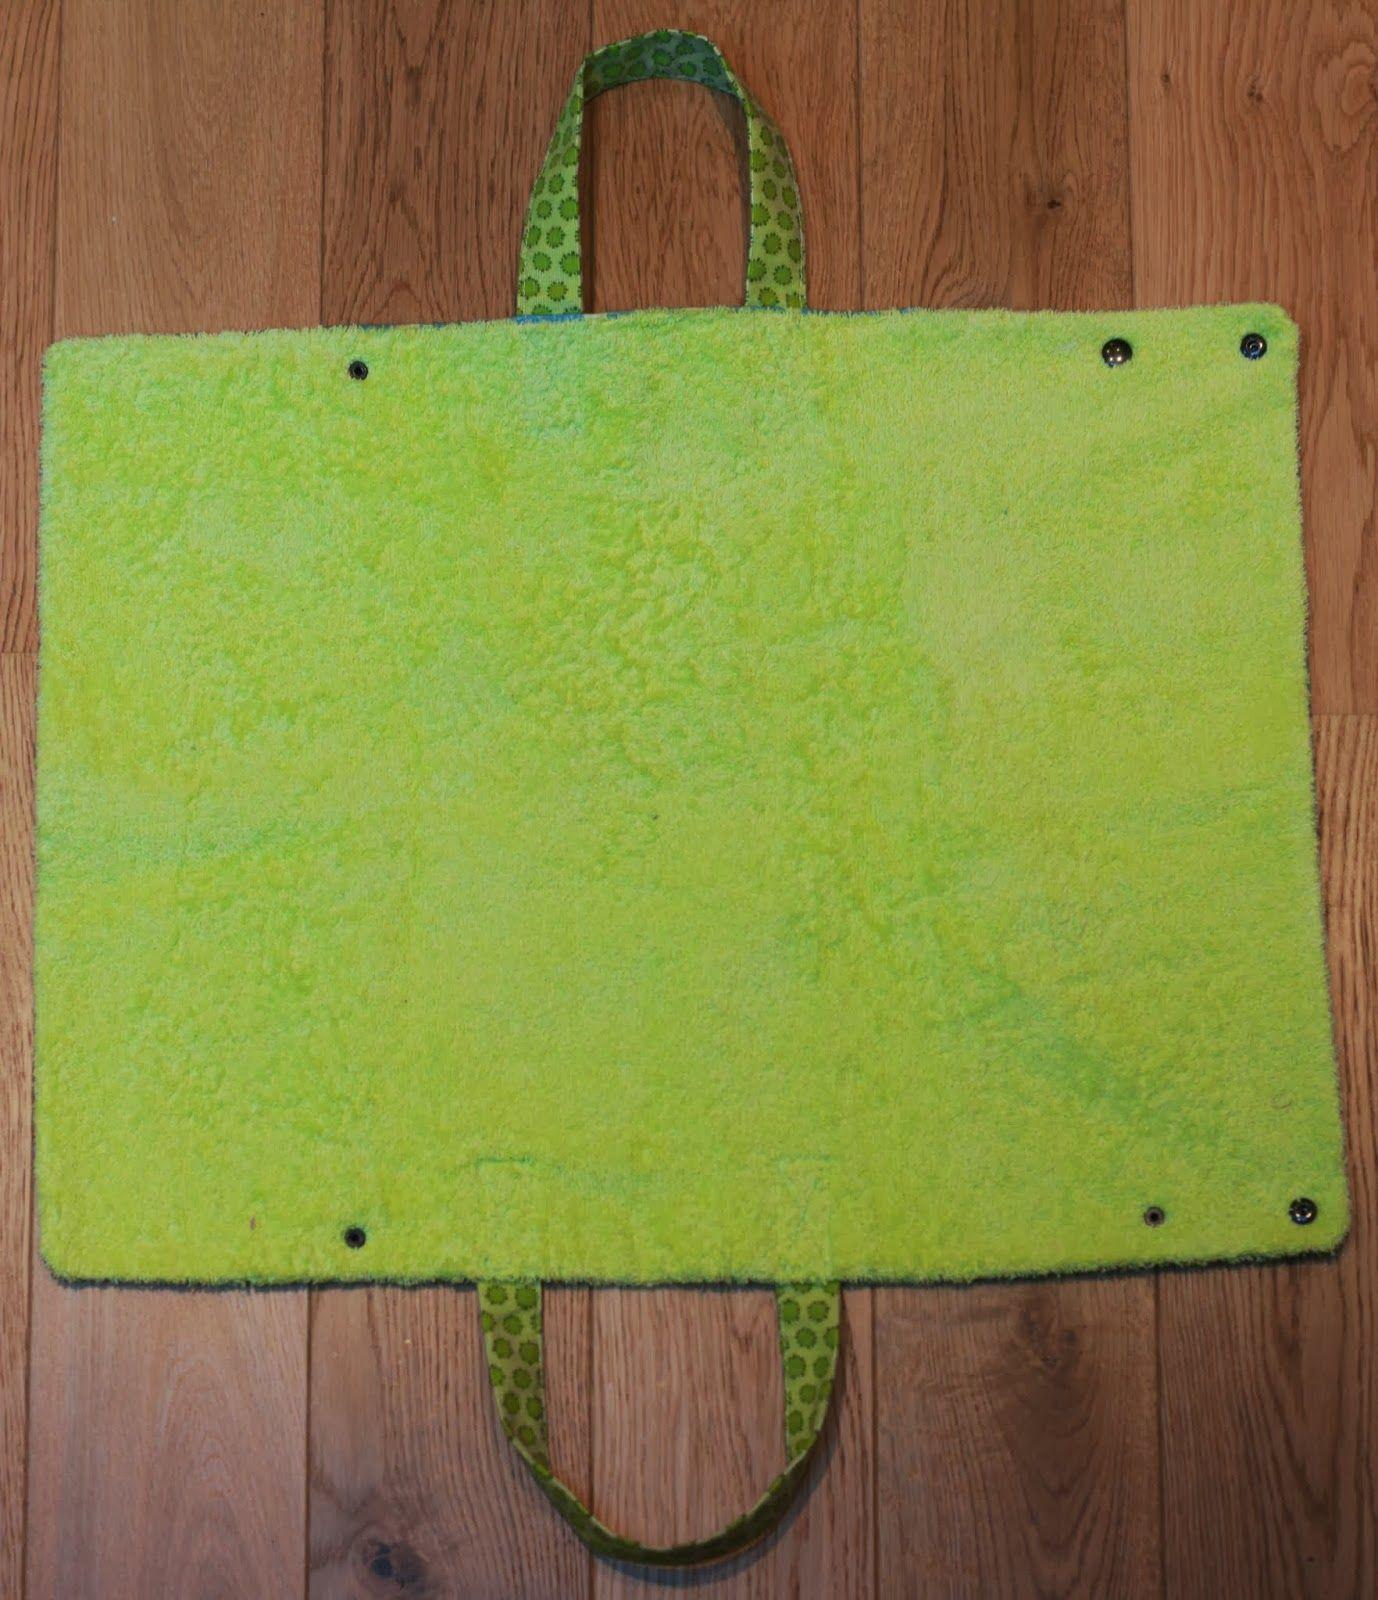 Les b bidules tapis de vestiaire piscine transformable en sac maillot un jour tu coudras for Can head lice transfer in swimming pools